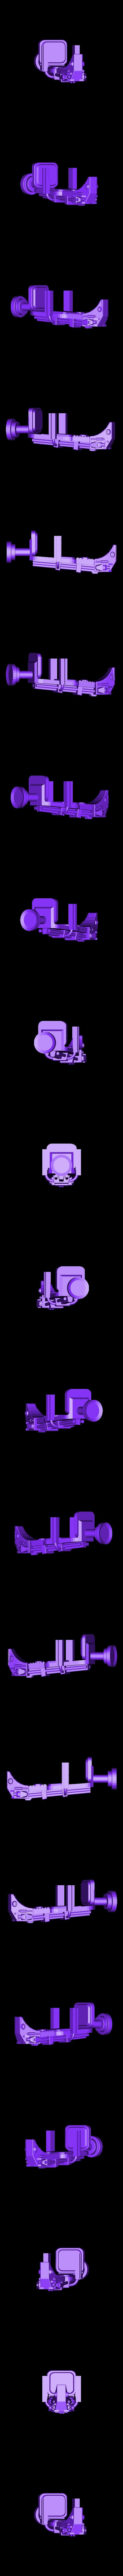 CP_05 (rep).stl Download free STL file Millenium Falcon, Cockpit.  • 3D printable object, Alex_x_x_x